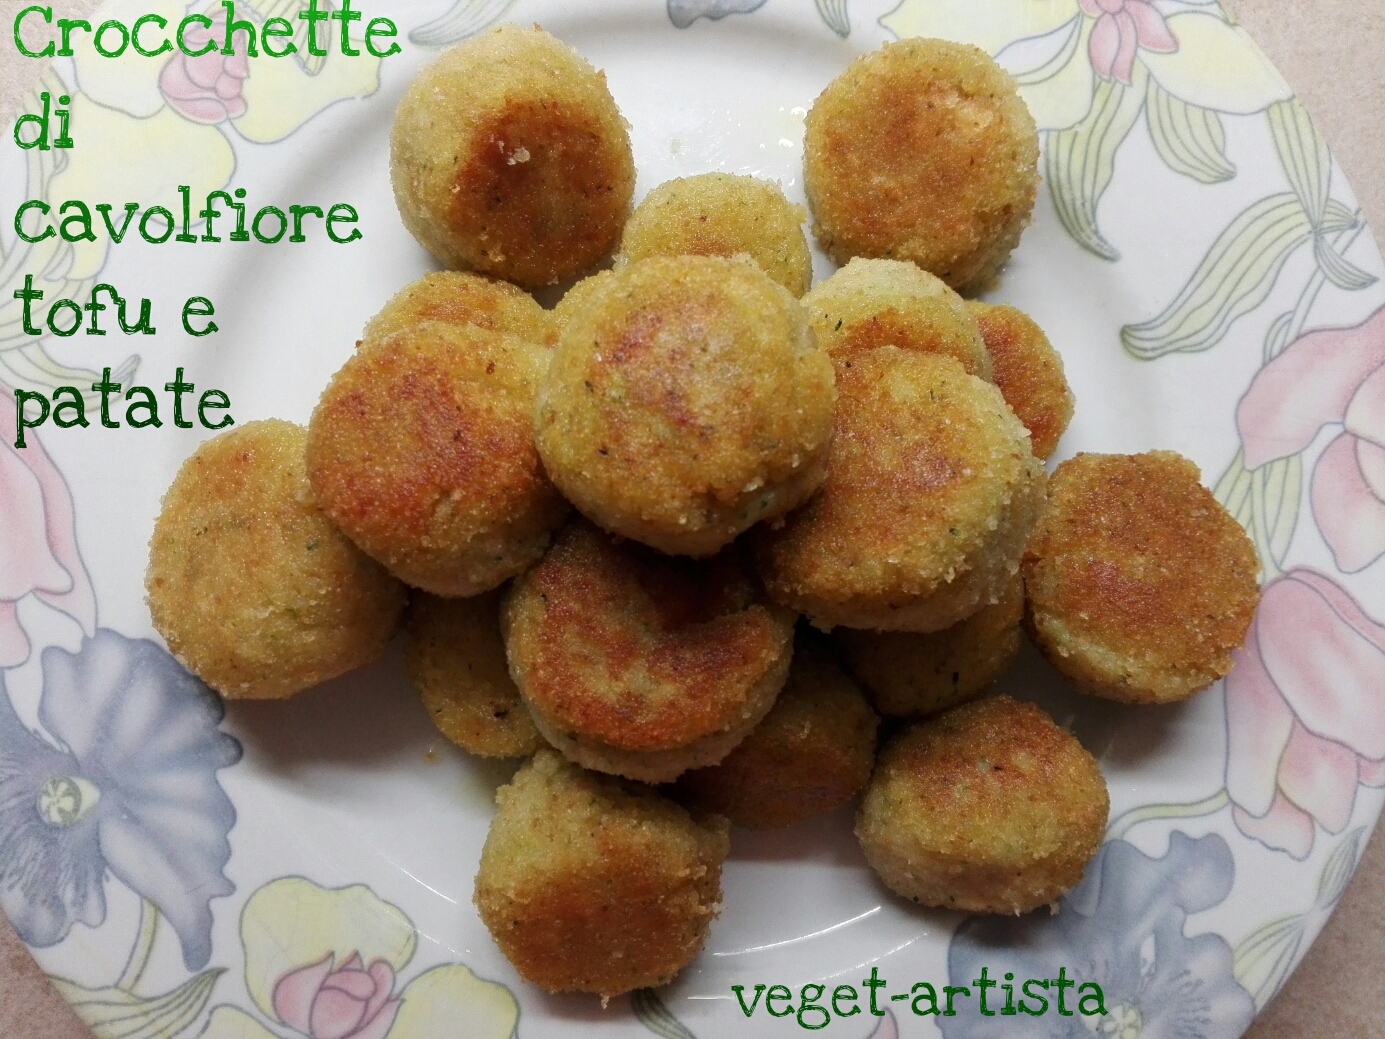 Crocchette di cavolfiore patate e tofu